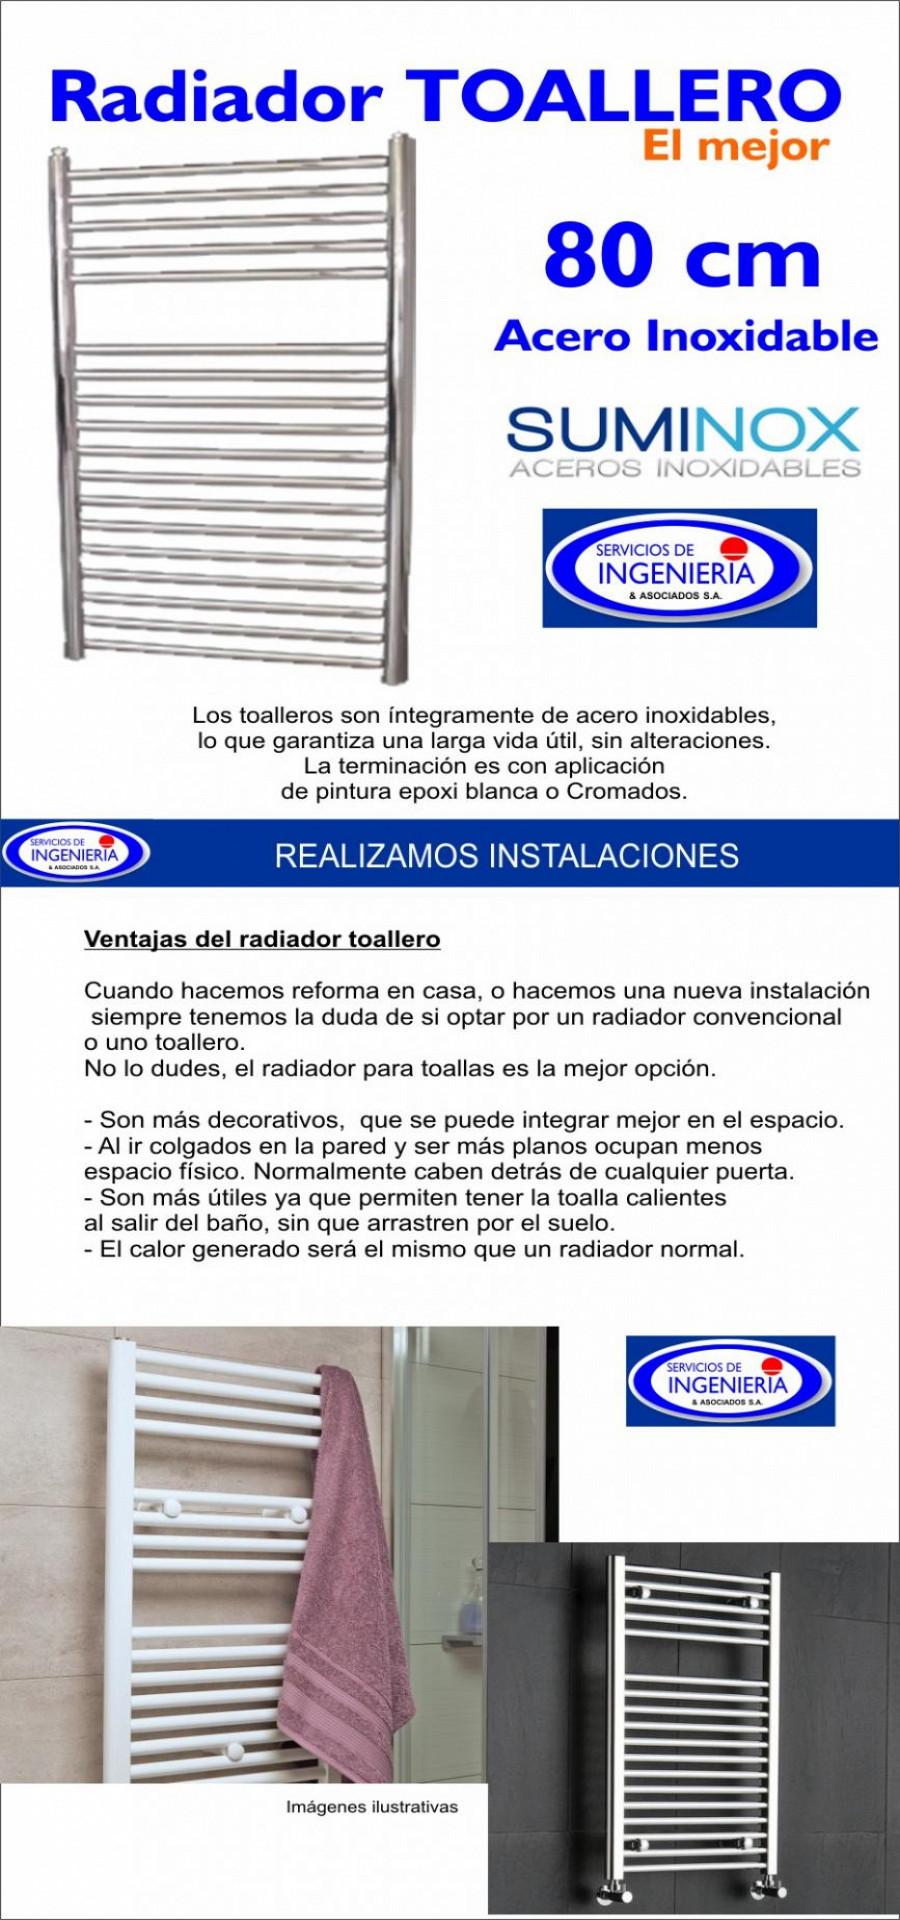 Servicios de ingenieria s a toallero en acero for Toallero acero inoxidable